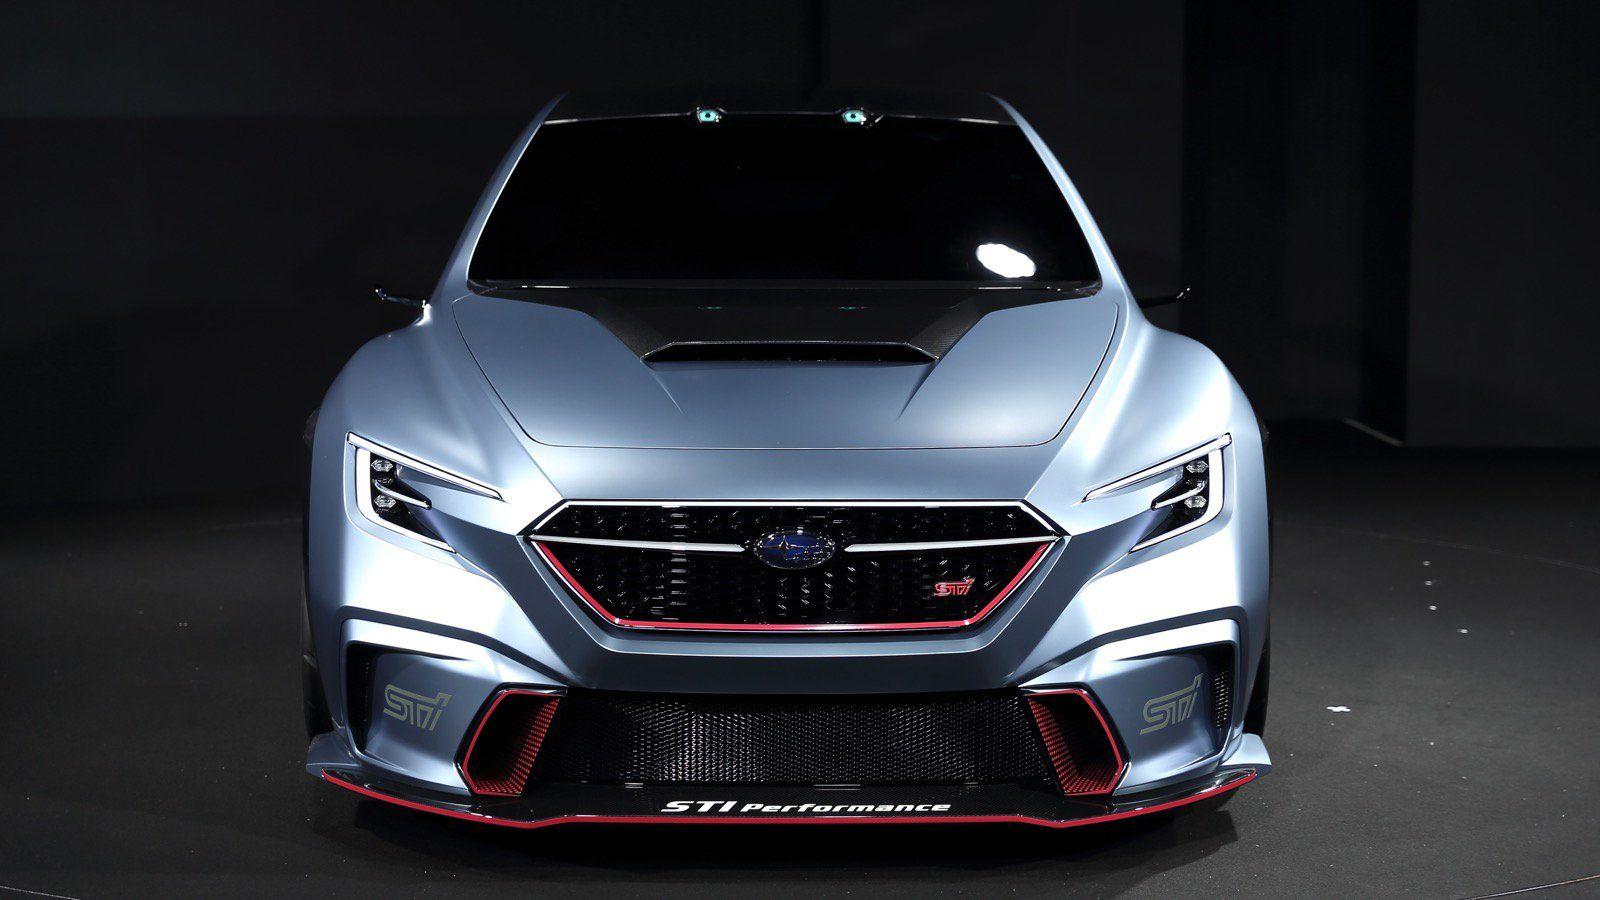 Next Generation Subaru Wrx Sti Getting New Engine Platform Styling Subaru Wrx Subaru Wrx Sti Wrx